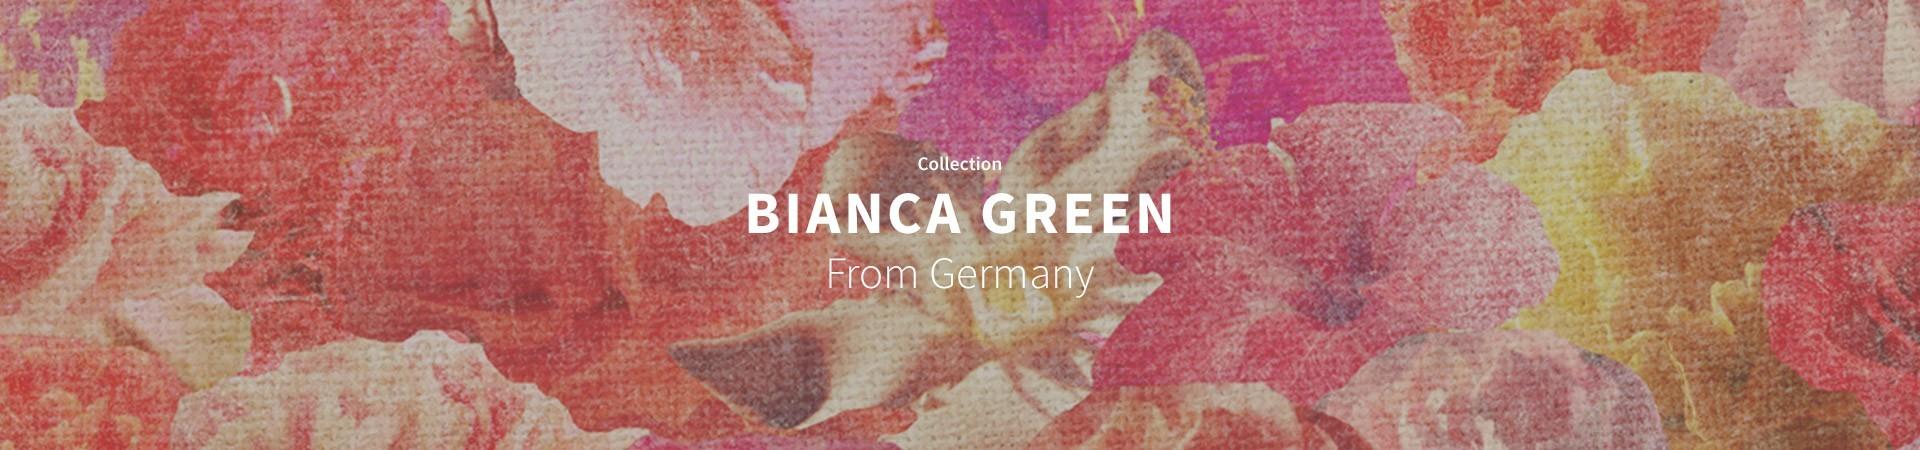 Bianca Green